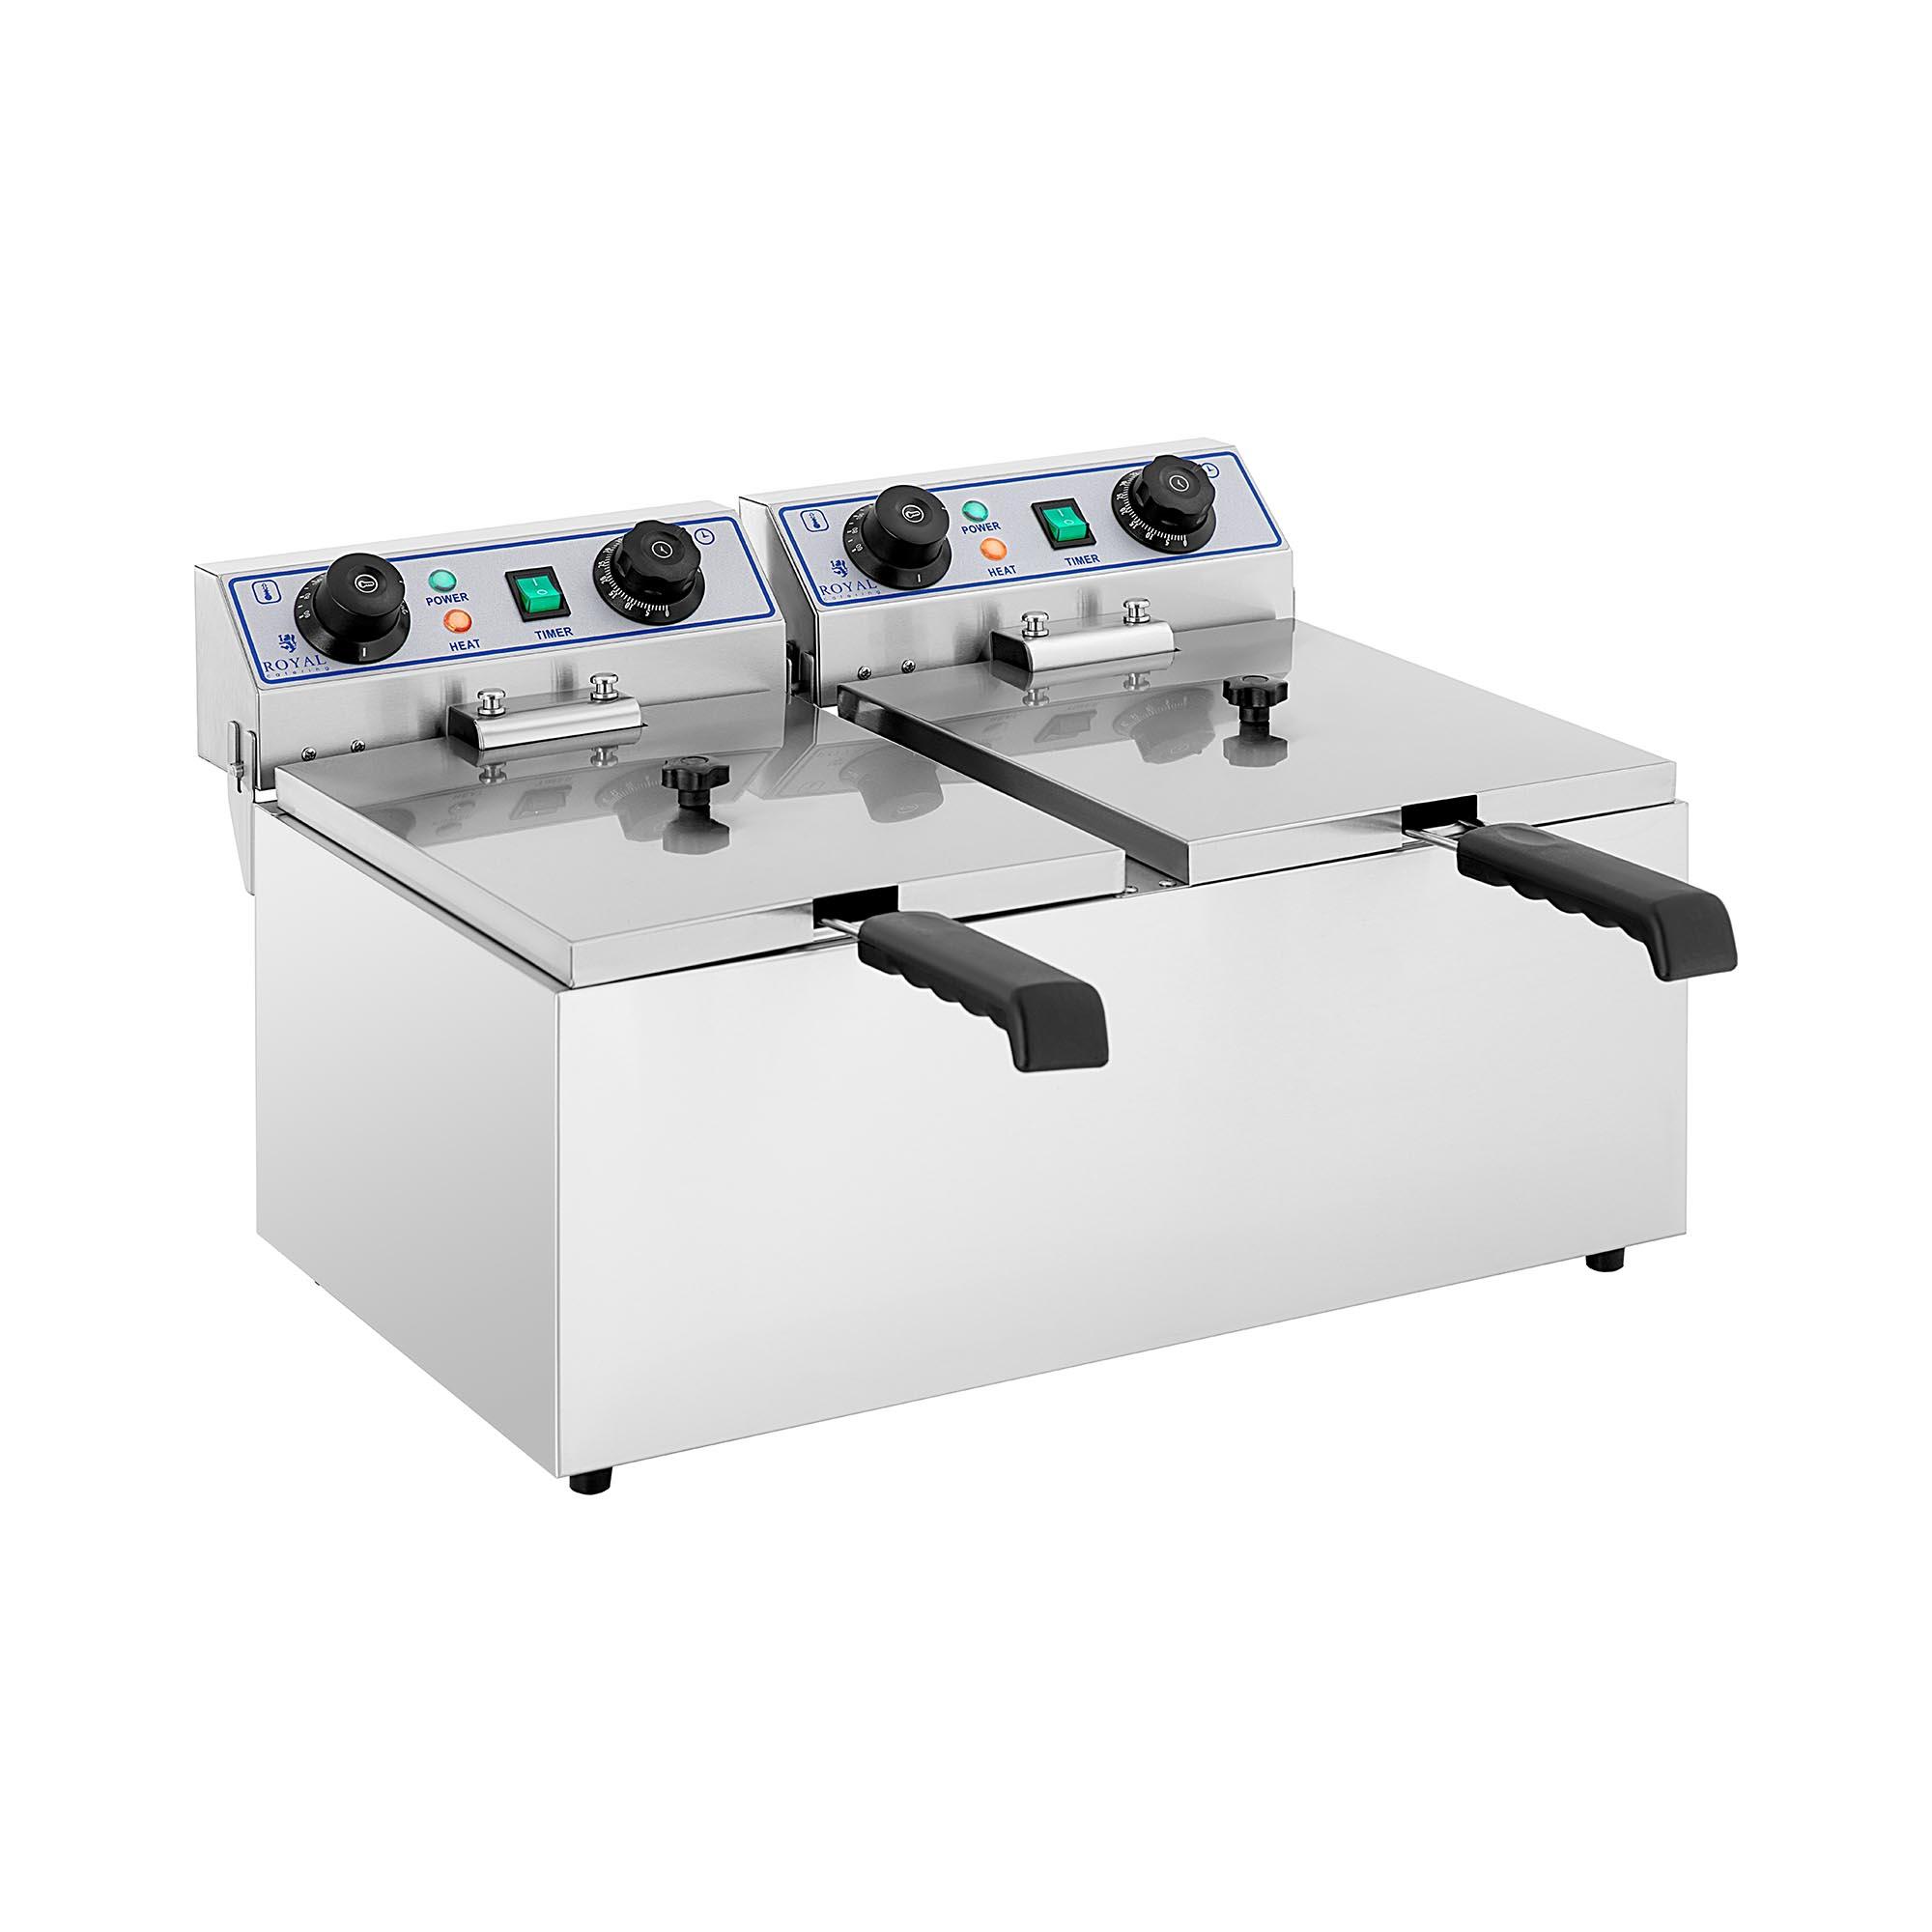 Royal Catering Elektro Doppel Fritteuse - 2 x 13 Liter mit Timerfunktion (60 Min) RCTF 13DH   2X13 TIMERFRITEUSE / FR